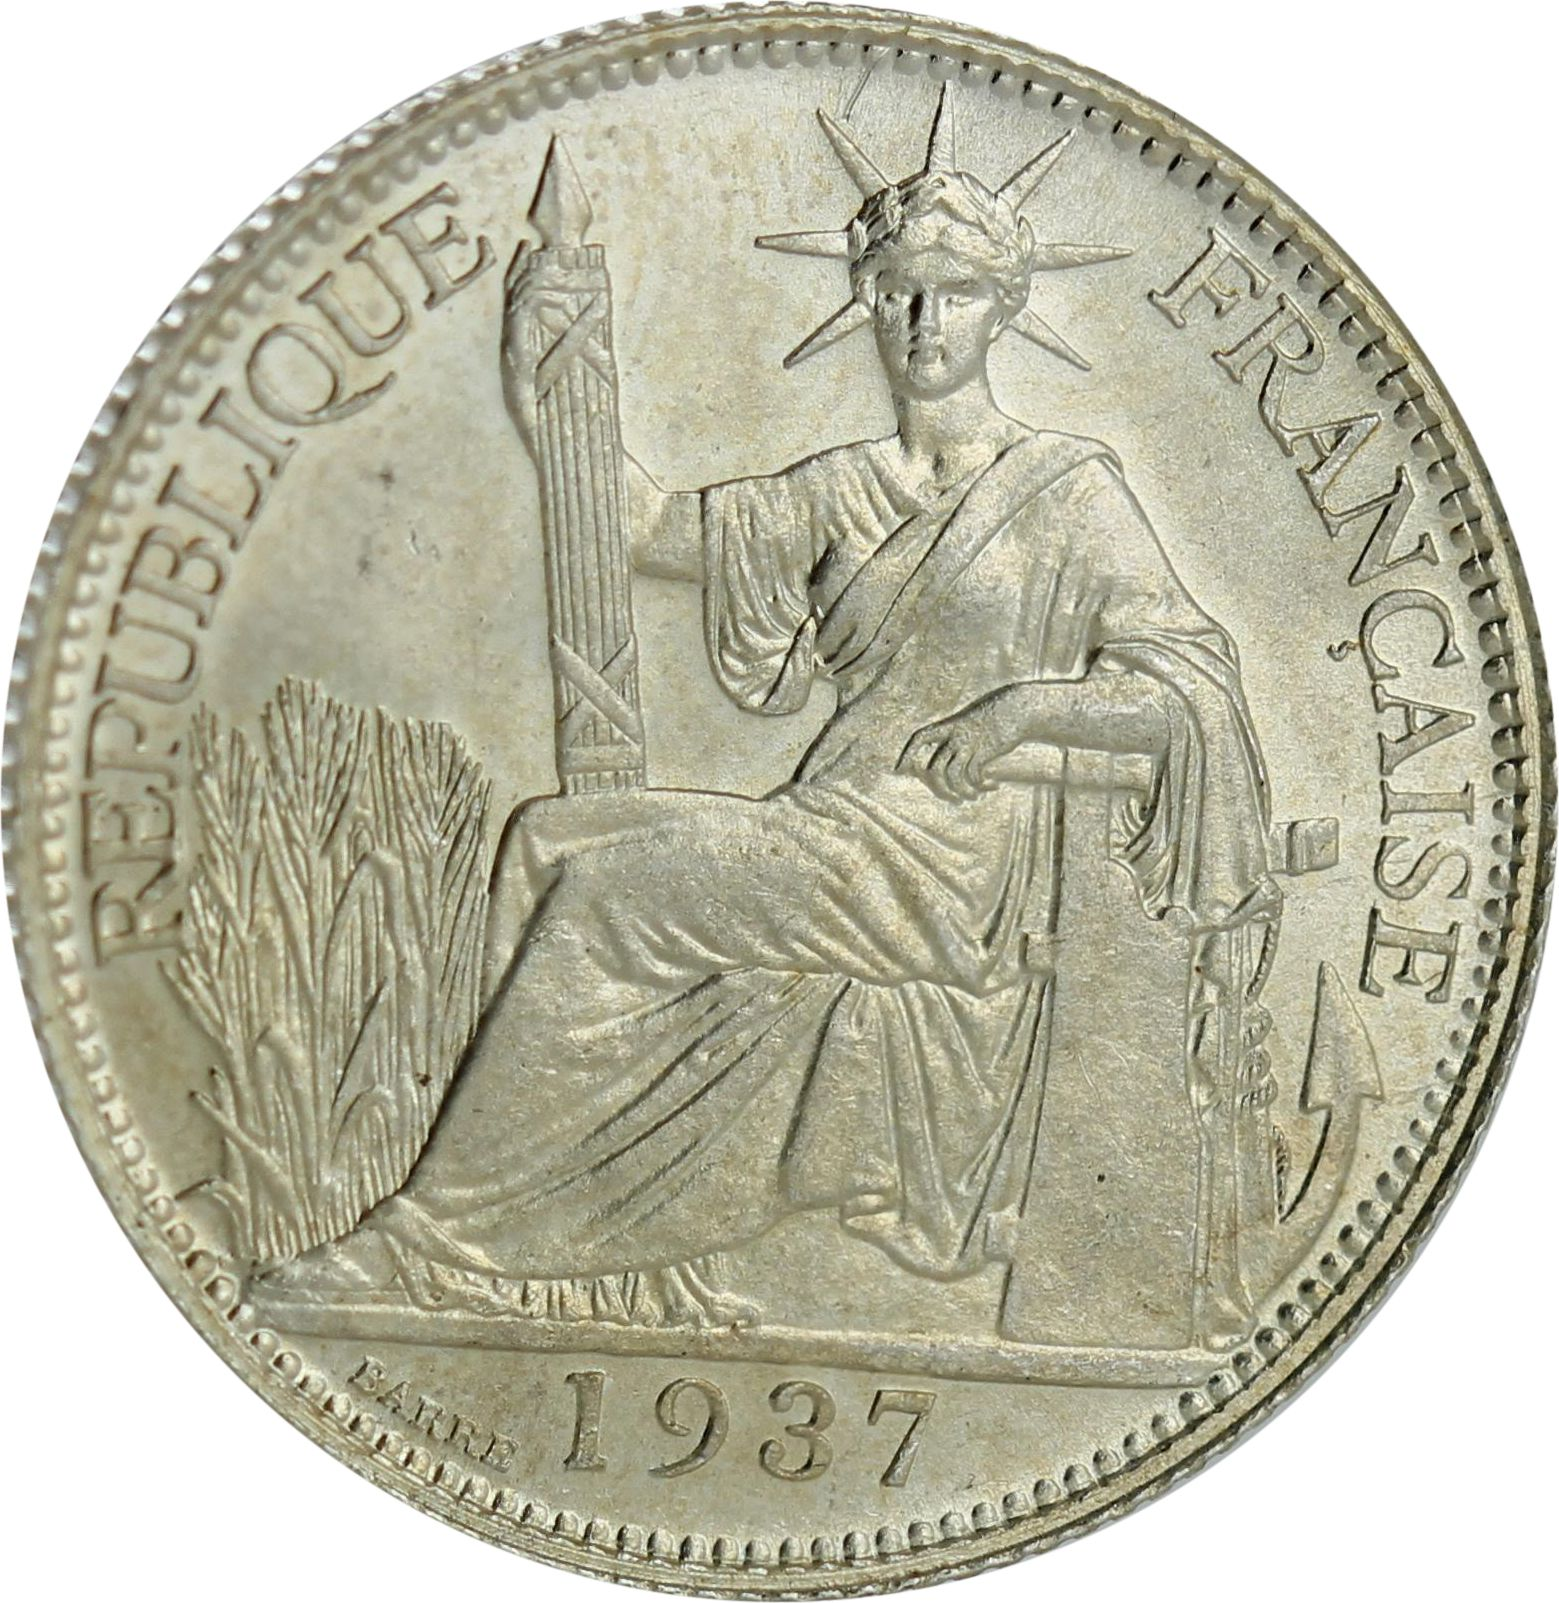 Indo-Chine Fr. 20 Centimes 1937 - SPL